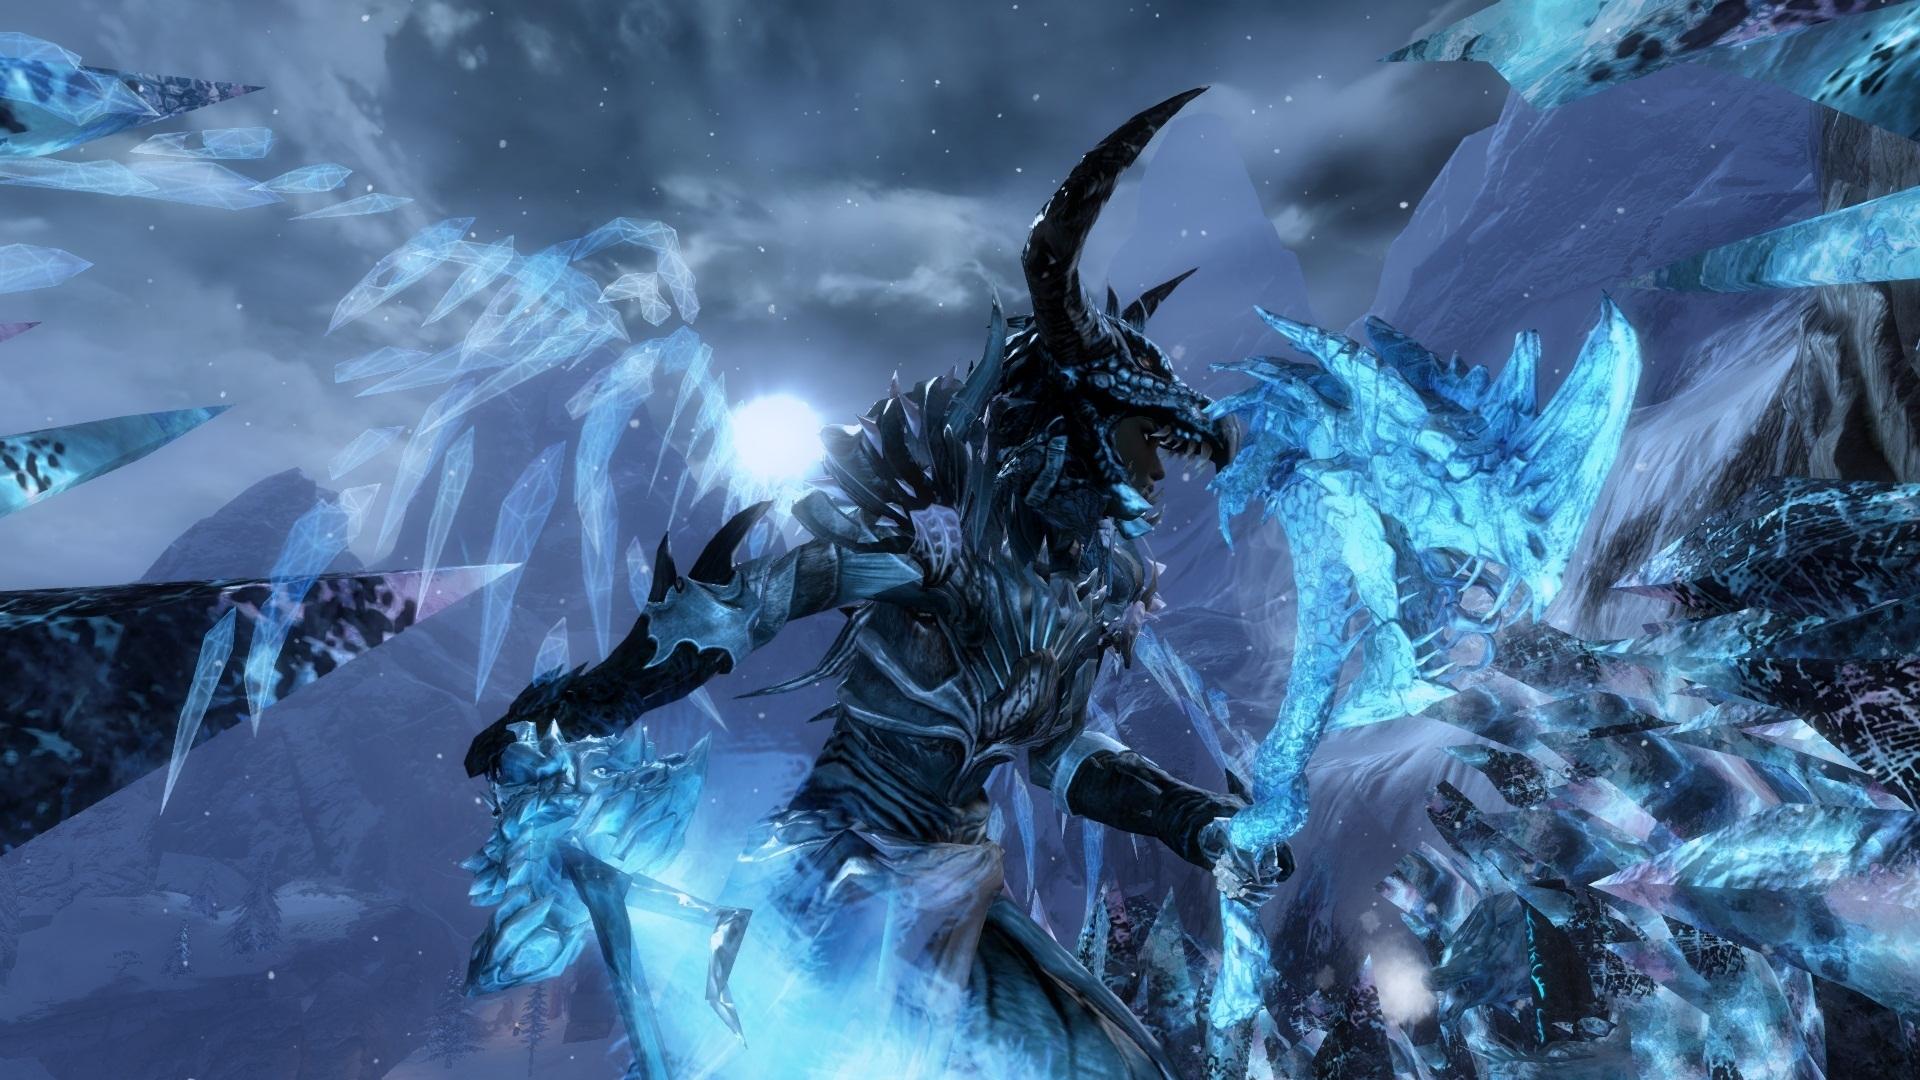 related image | i luv dragons | pinterest | hd desktop, wallpaper